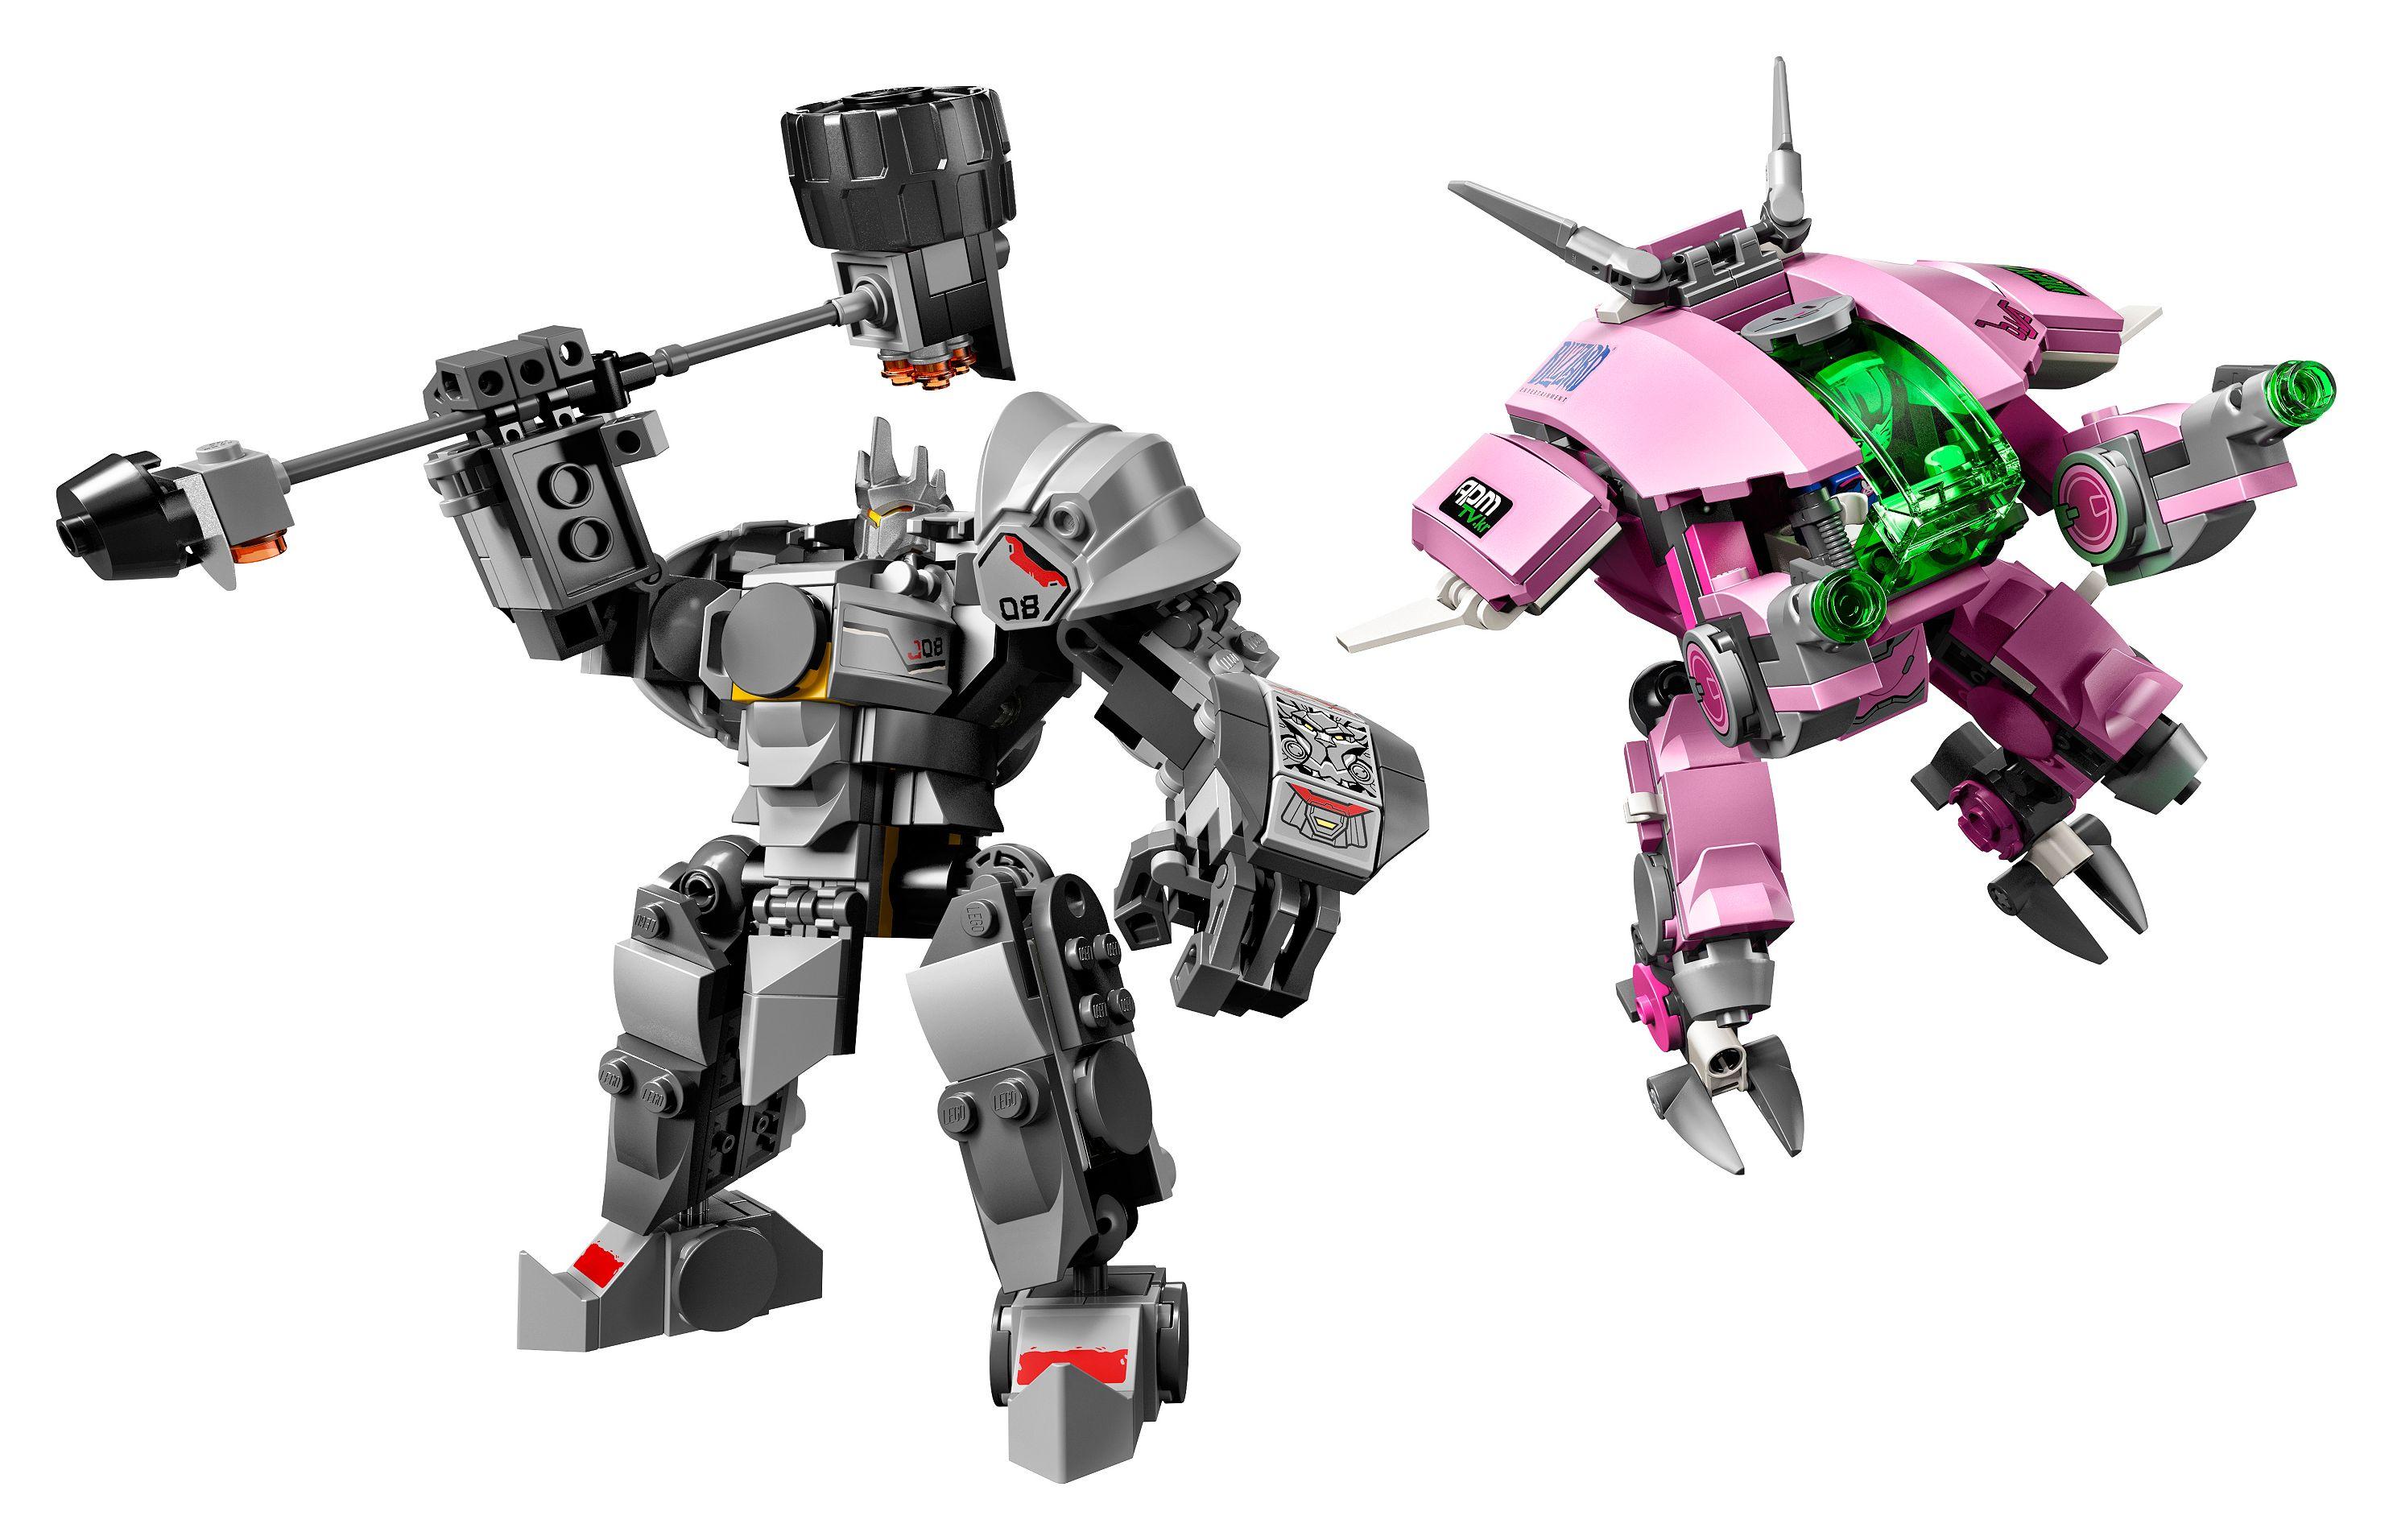 Le monde d'Overwatch en Lego